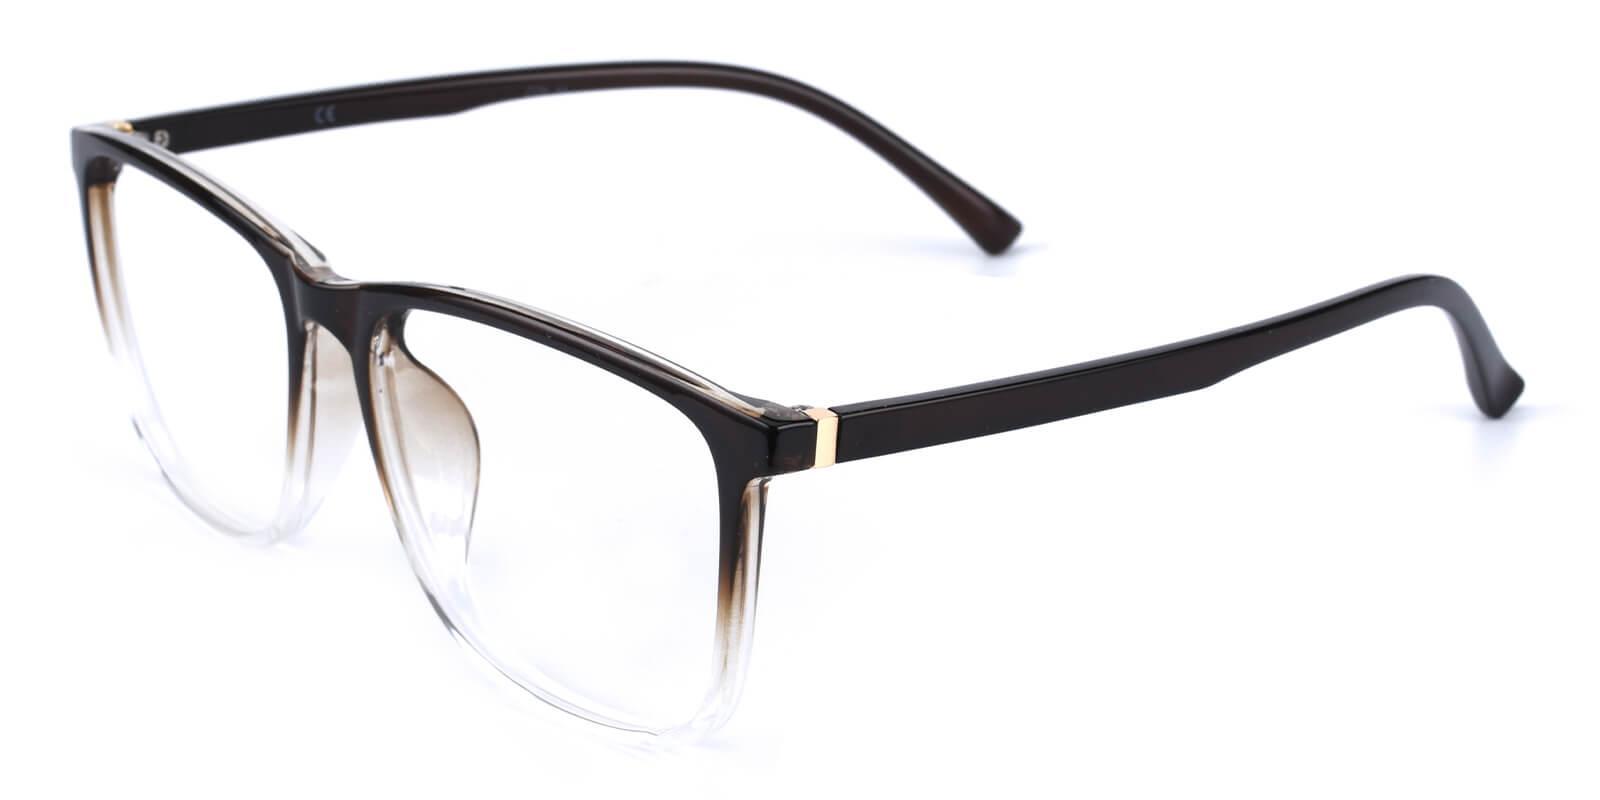 Poise-Brown-Square-TR-Eyeglasses-detail